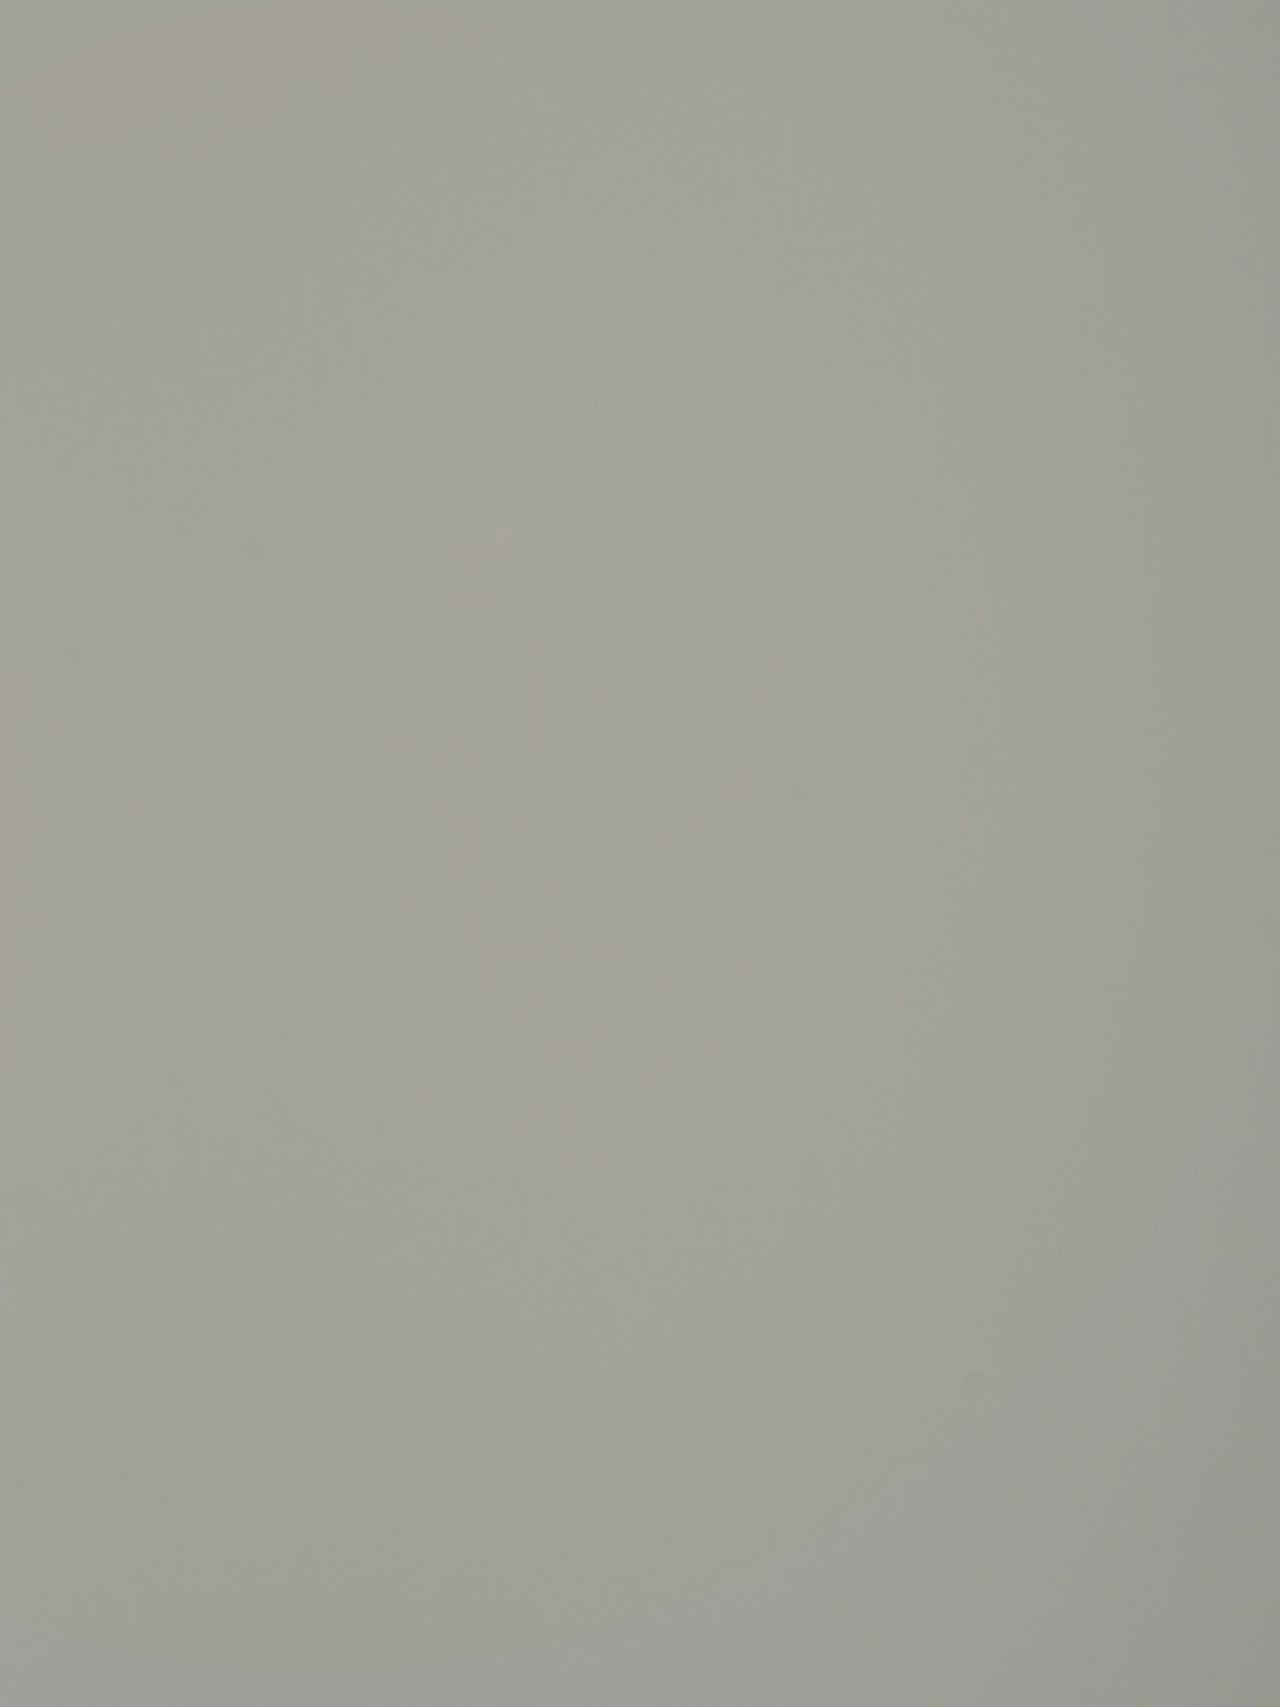 МДФ HM02/UA90 19мм Piombo/Seta 3050х1300мм